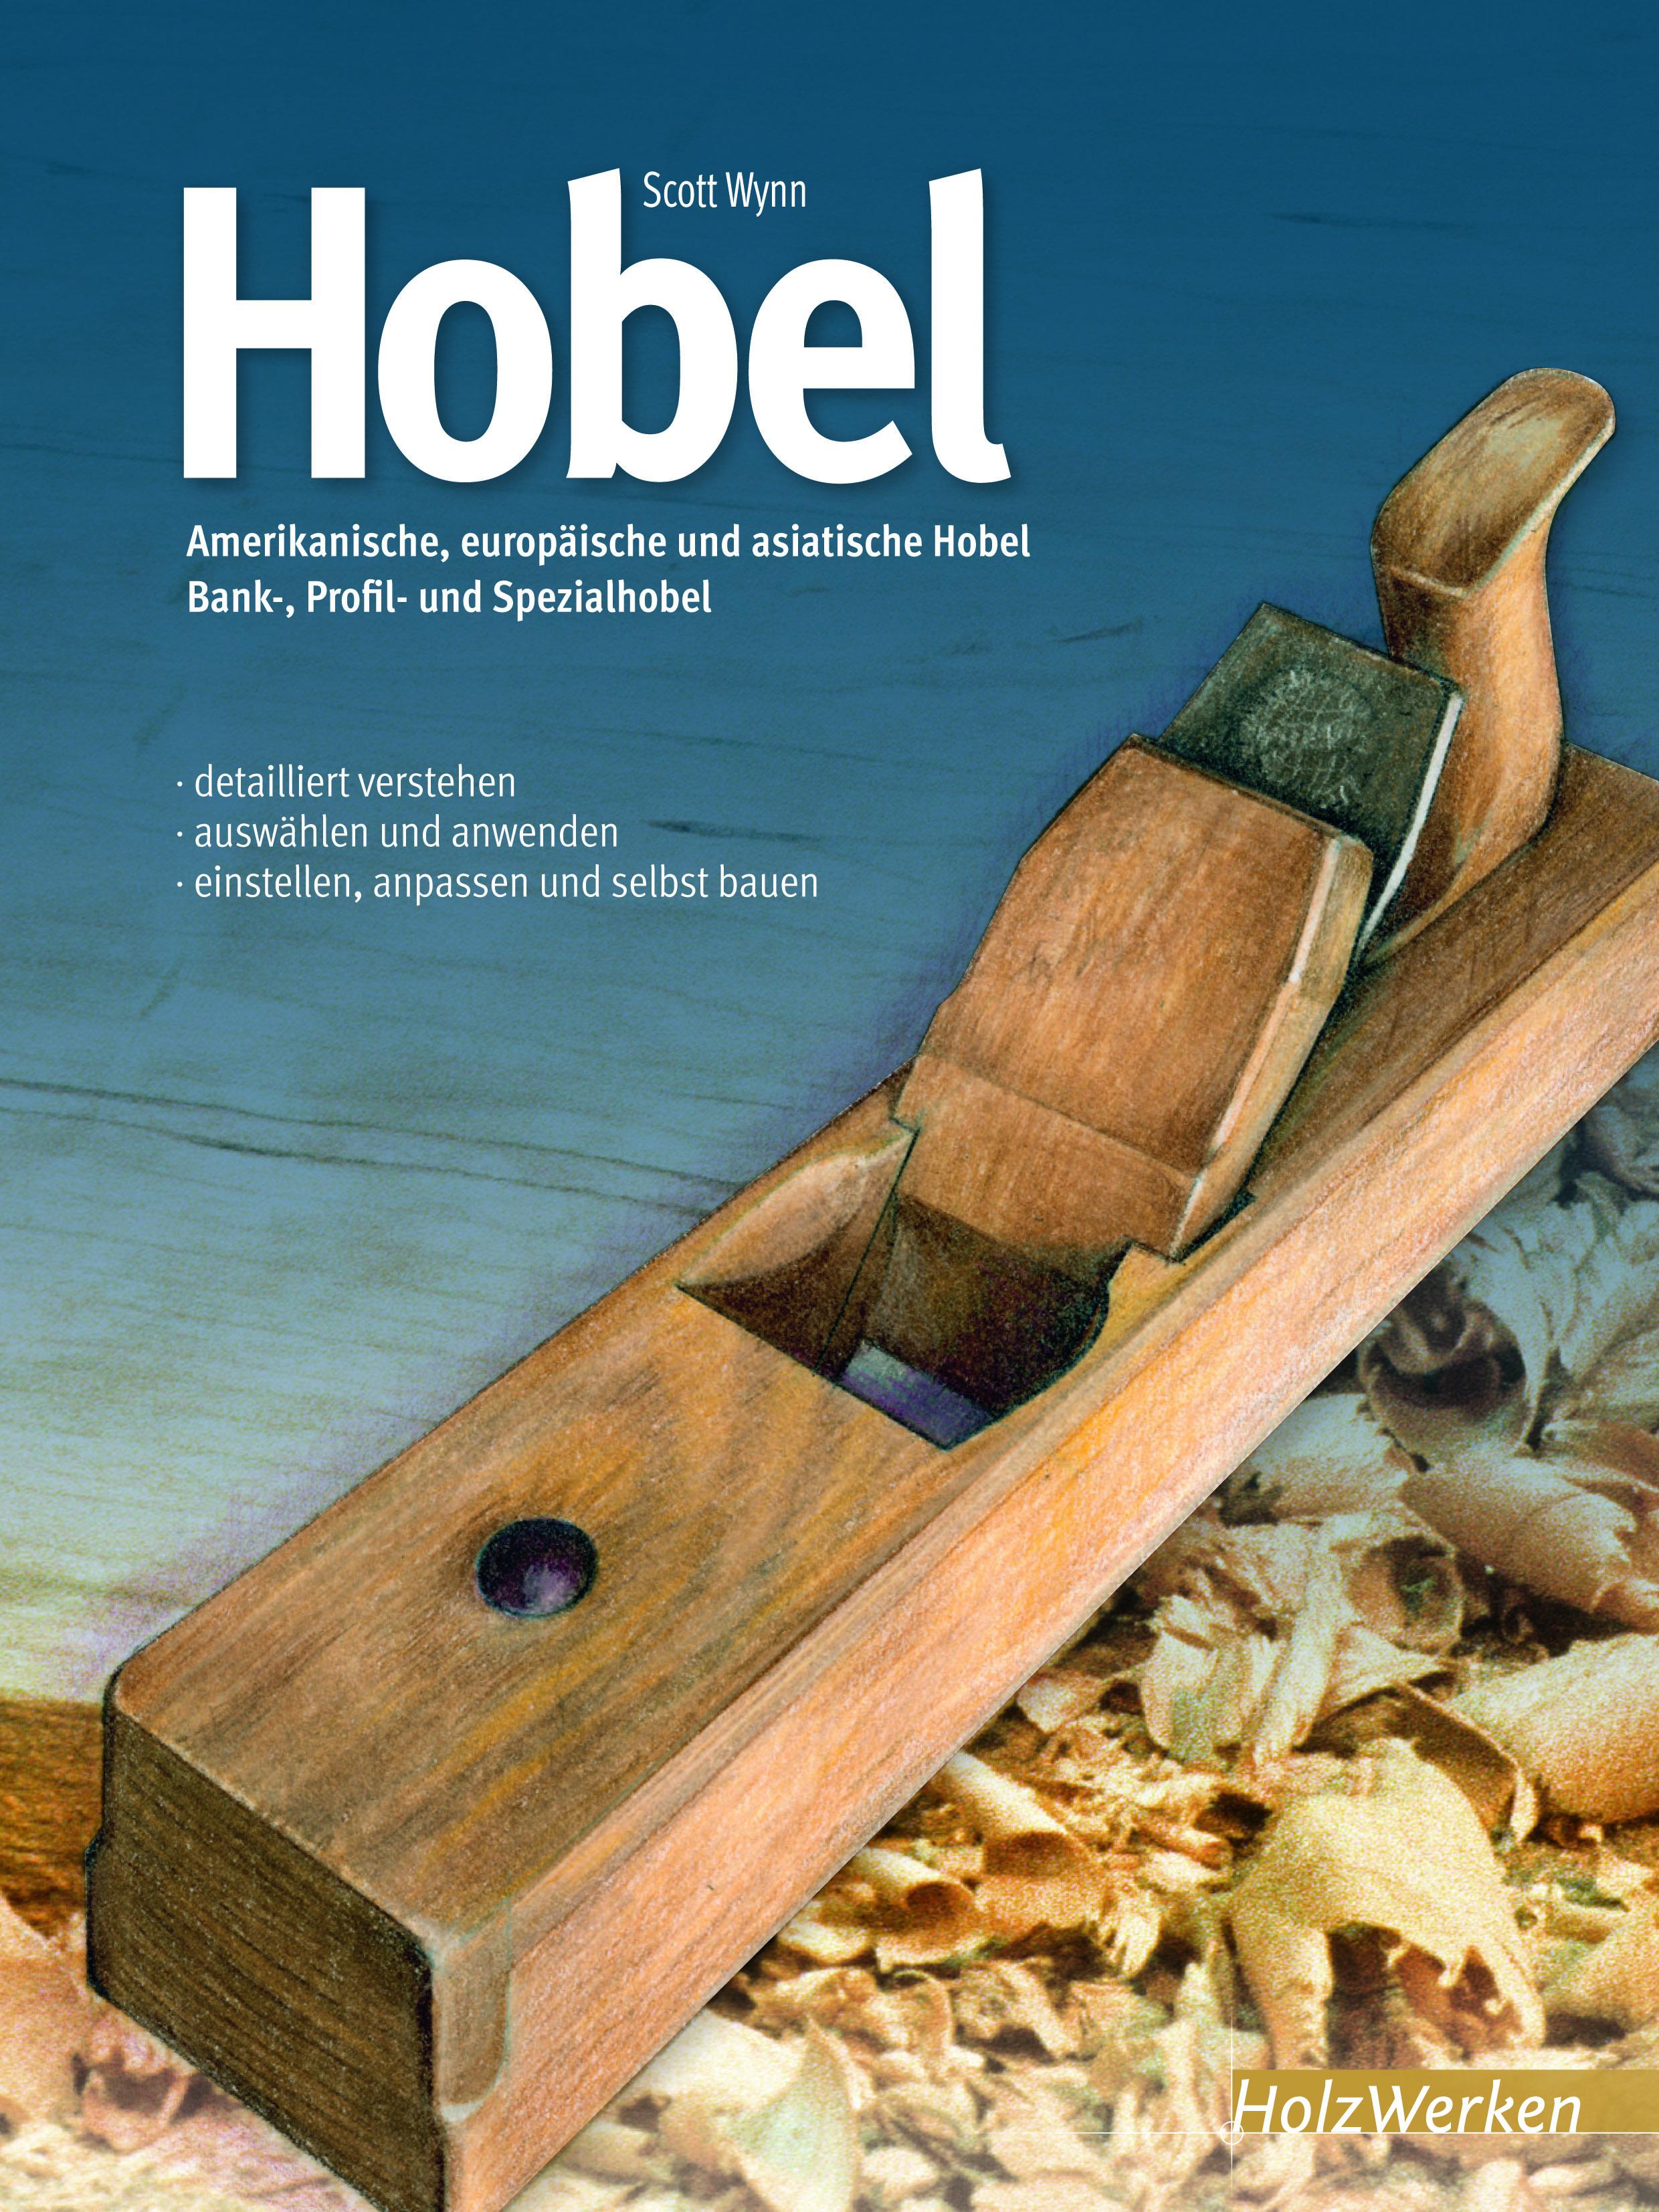 Boek: Hobel